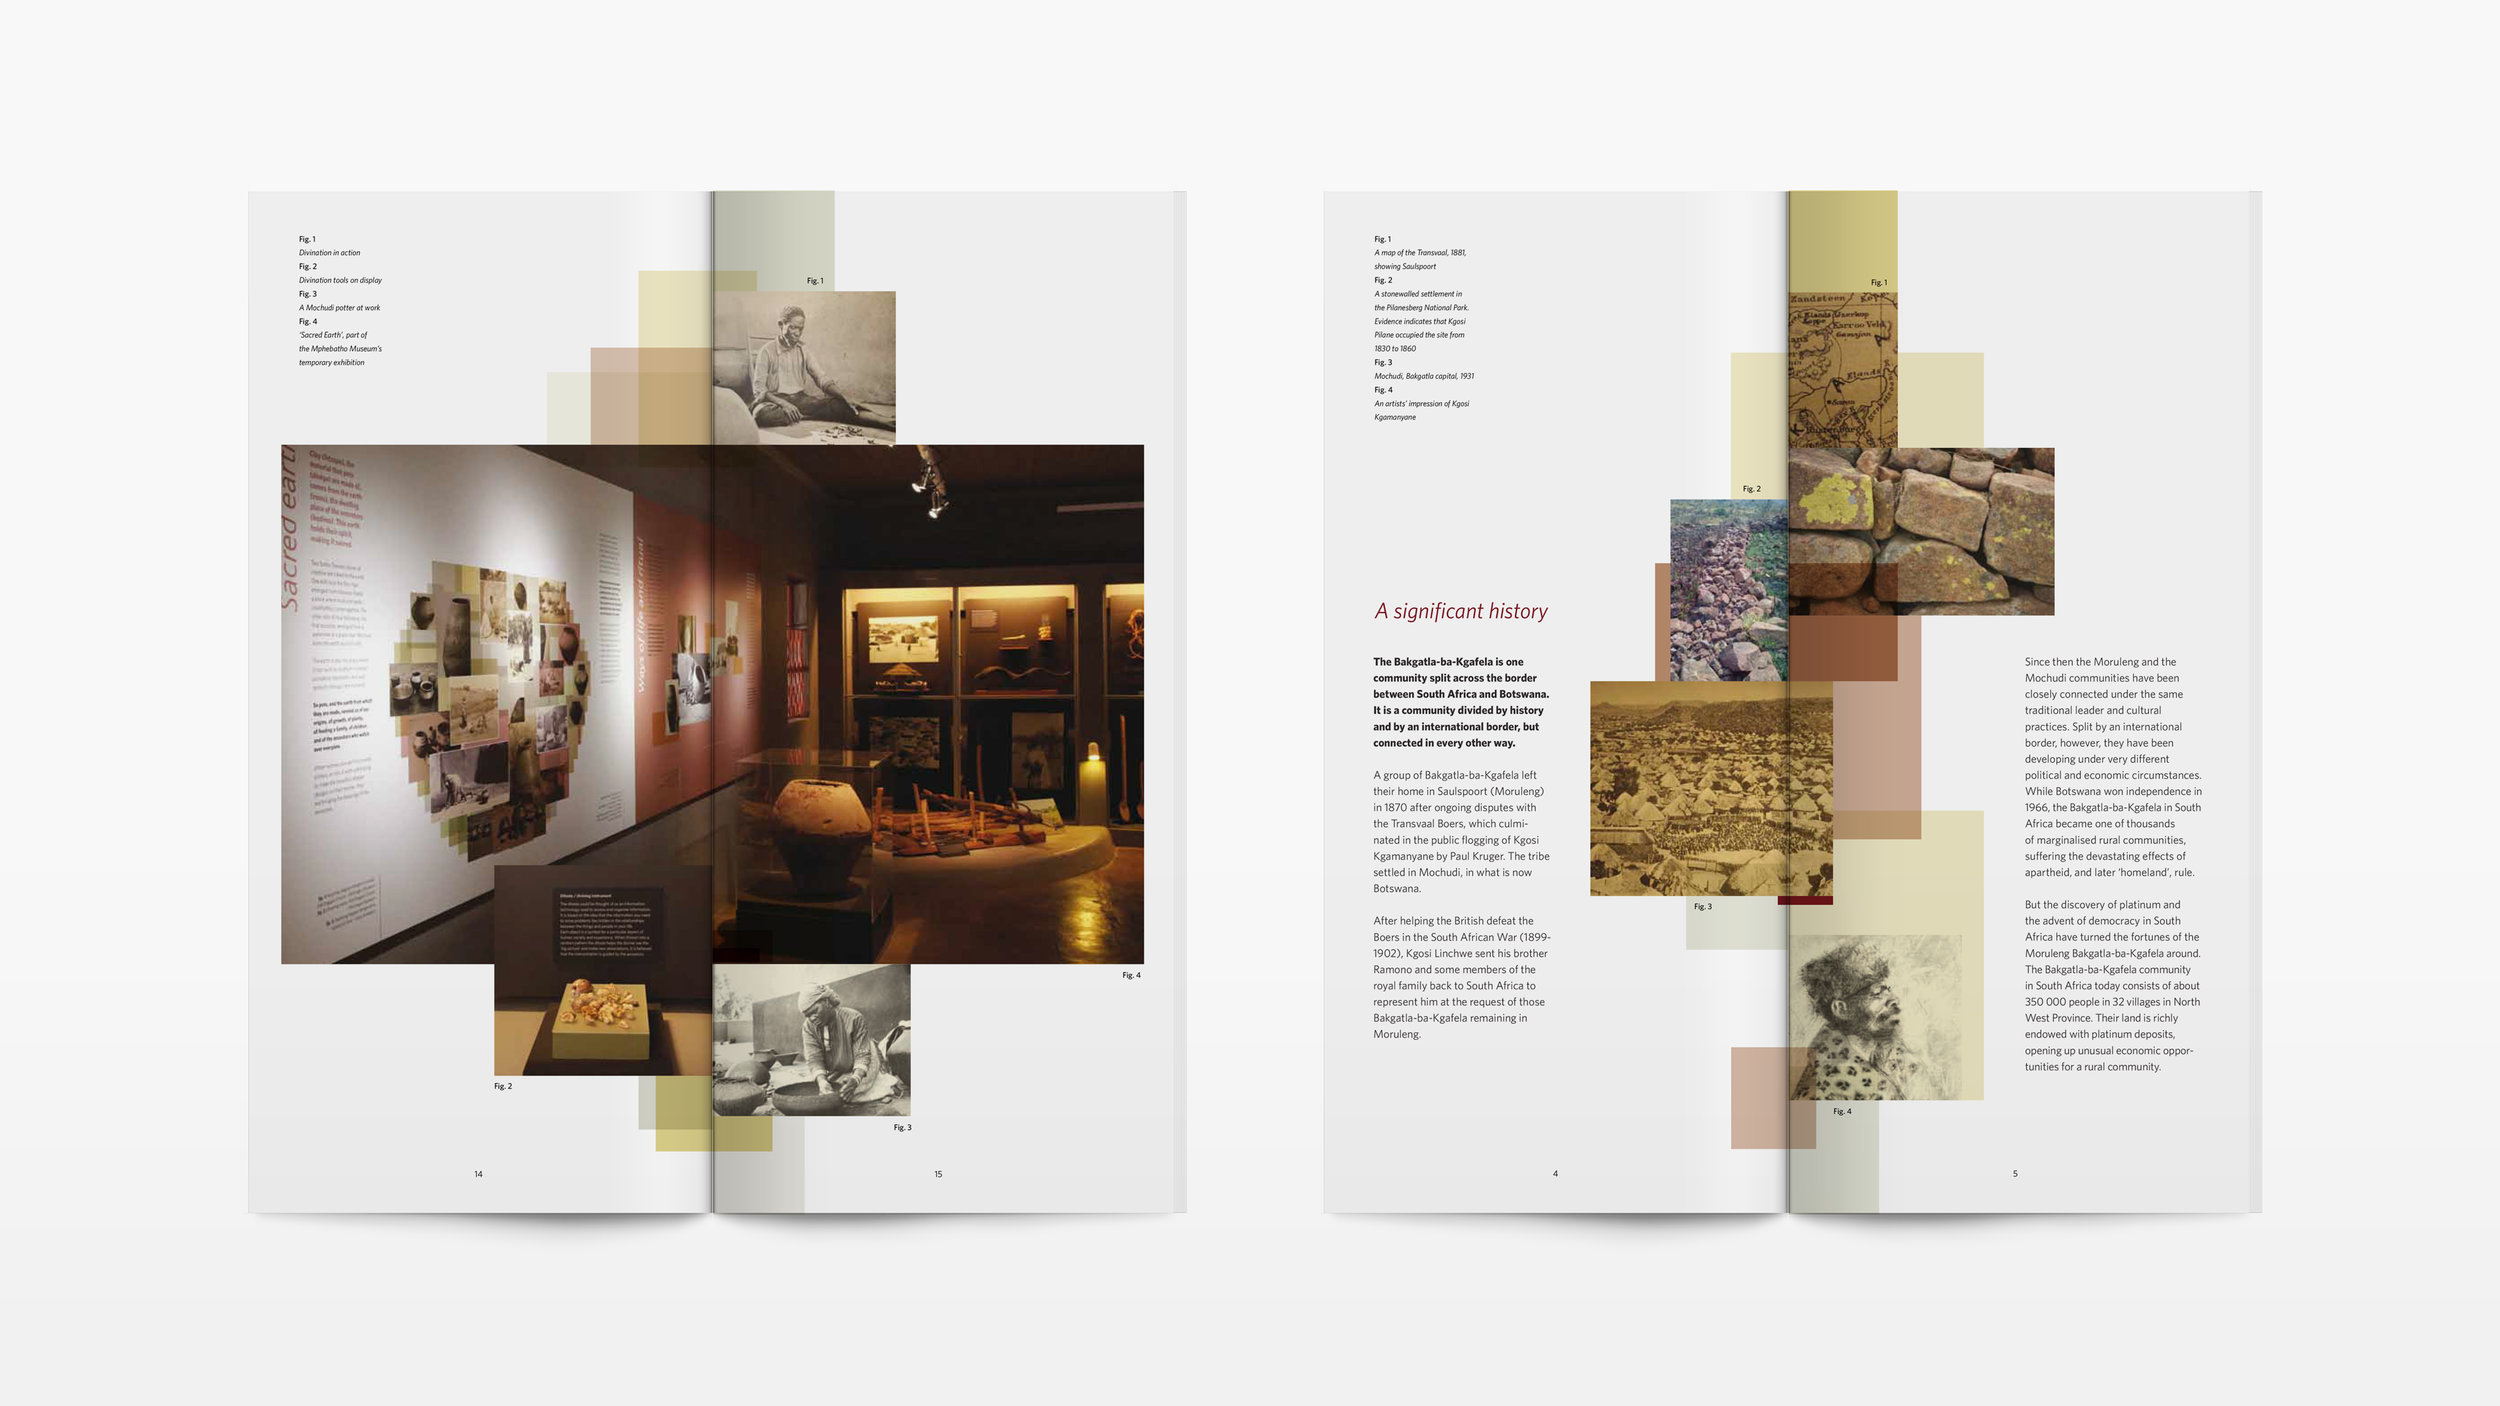 Brand_republica_mphebatho_museum_leaflet_design_01_spreads.jpg